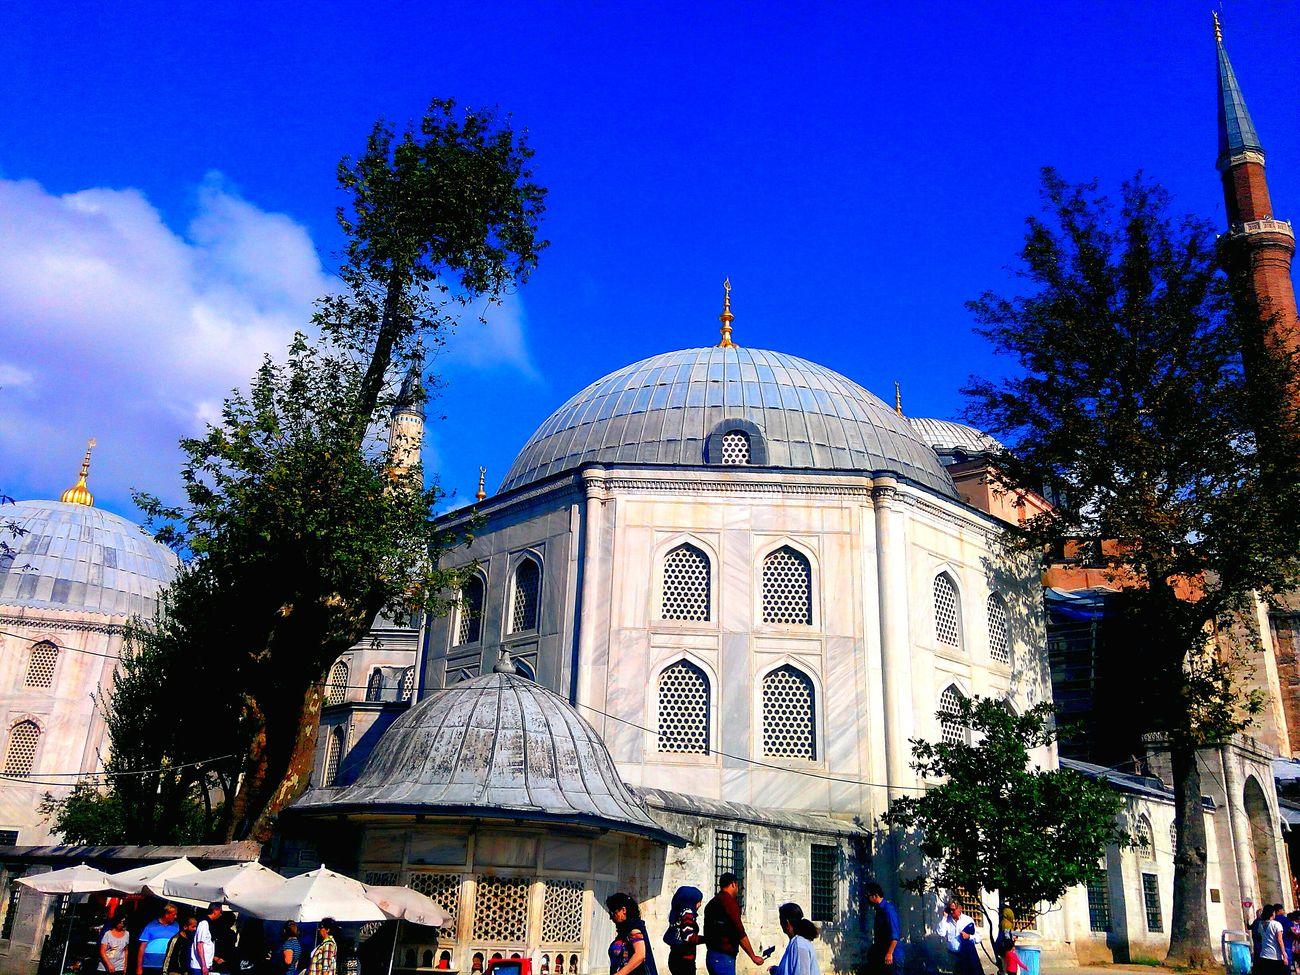 Historical Artifact Praying Tarihi Architecture Istanbul Turkiye Historycal Place Mimari Mosque